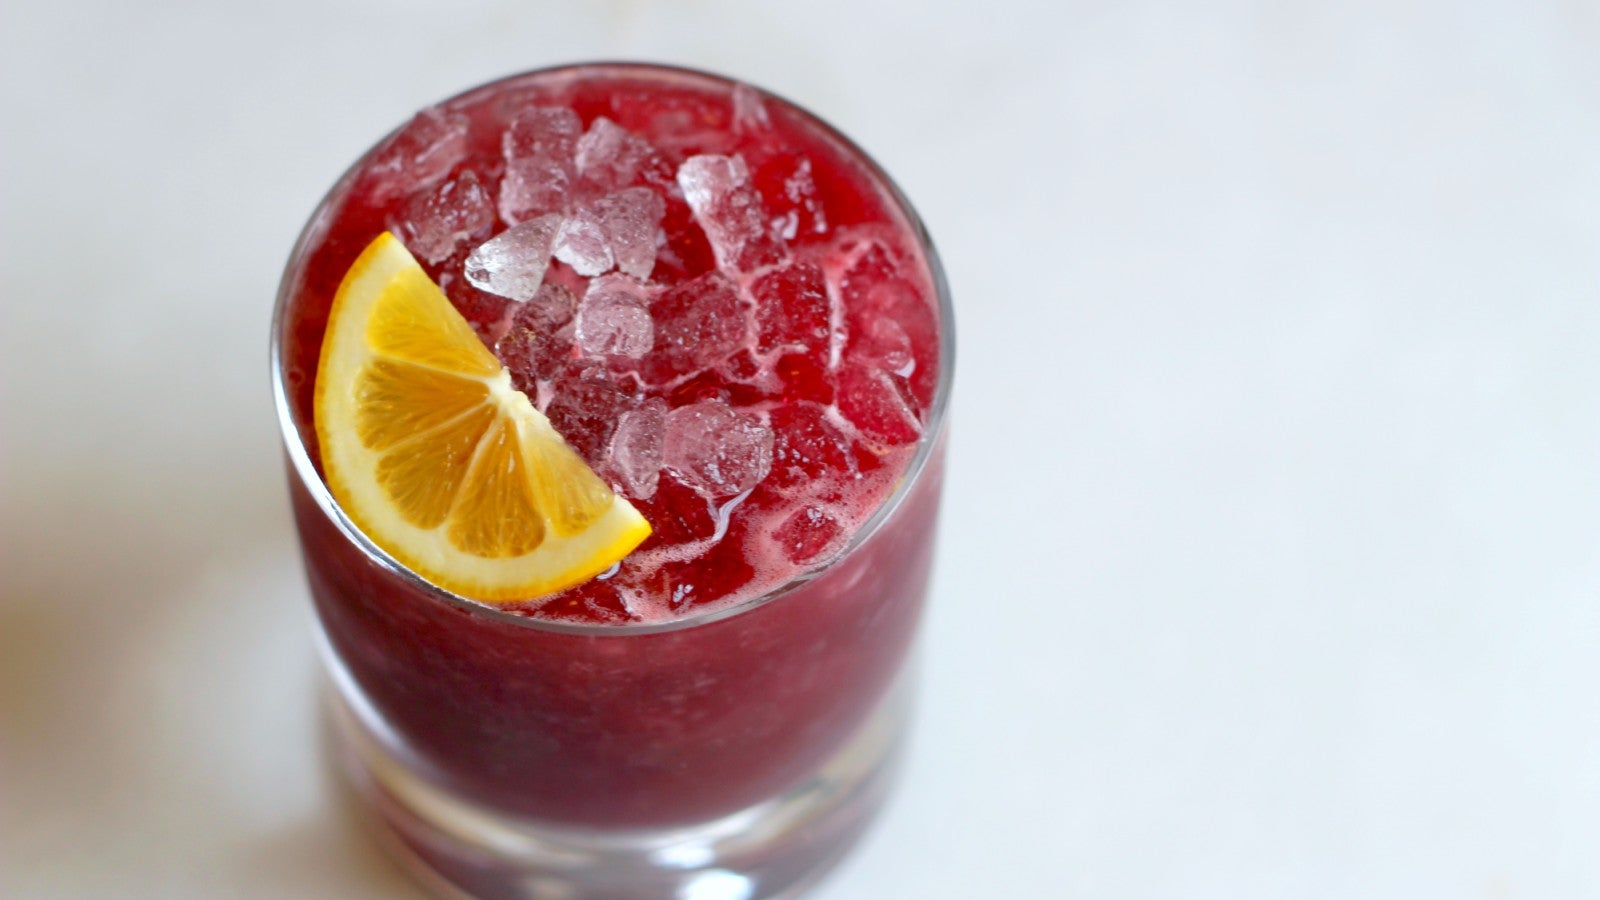 3-Ingredient Happy Hour: A Blackberry Jam Bramble